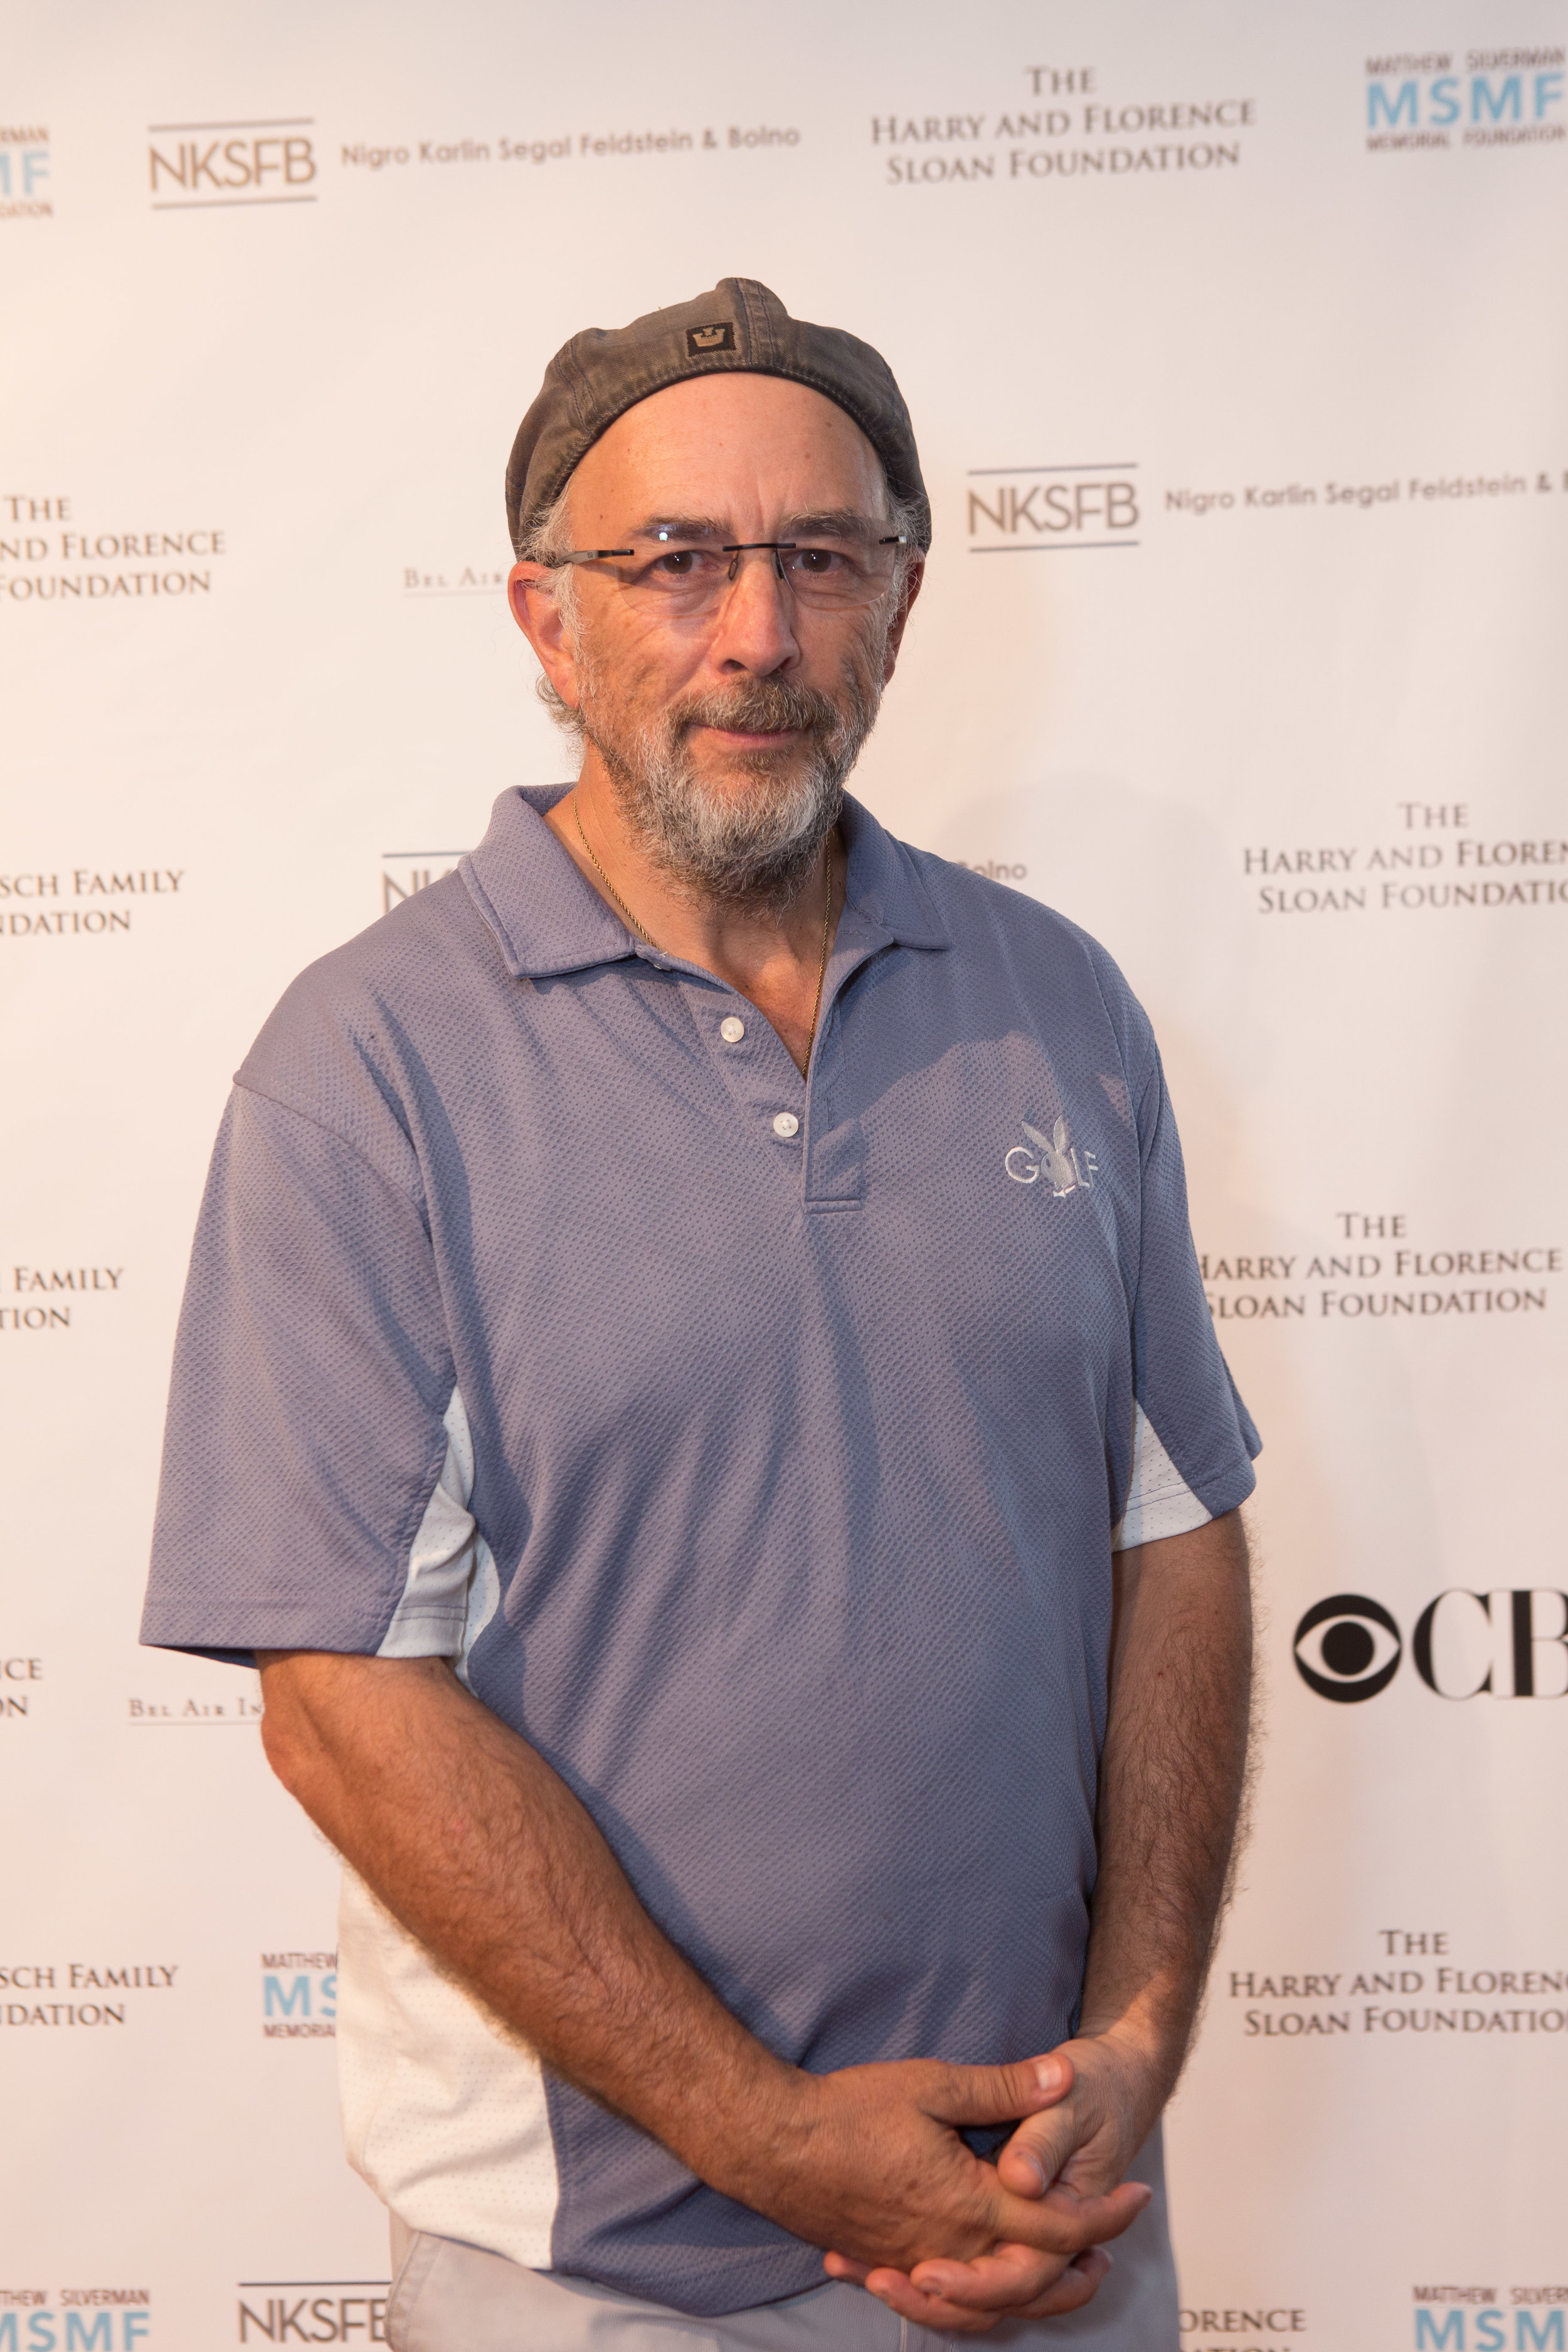 IMG_8254-CELEBRITY-Richard Schiff.jpg